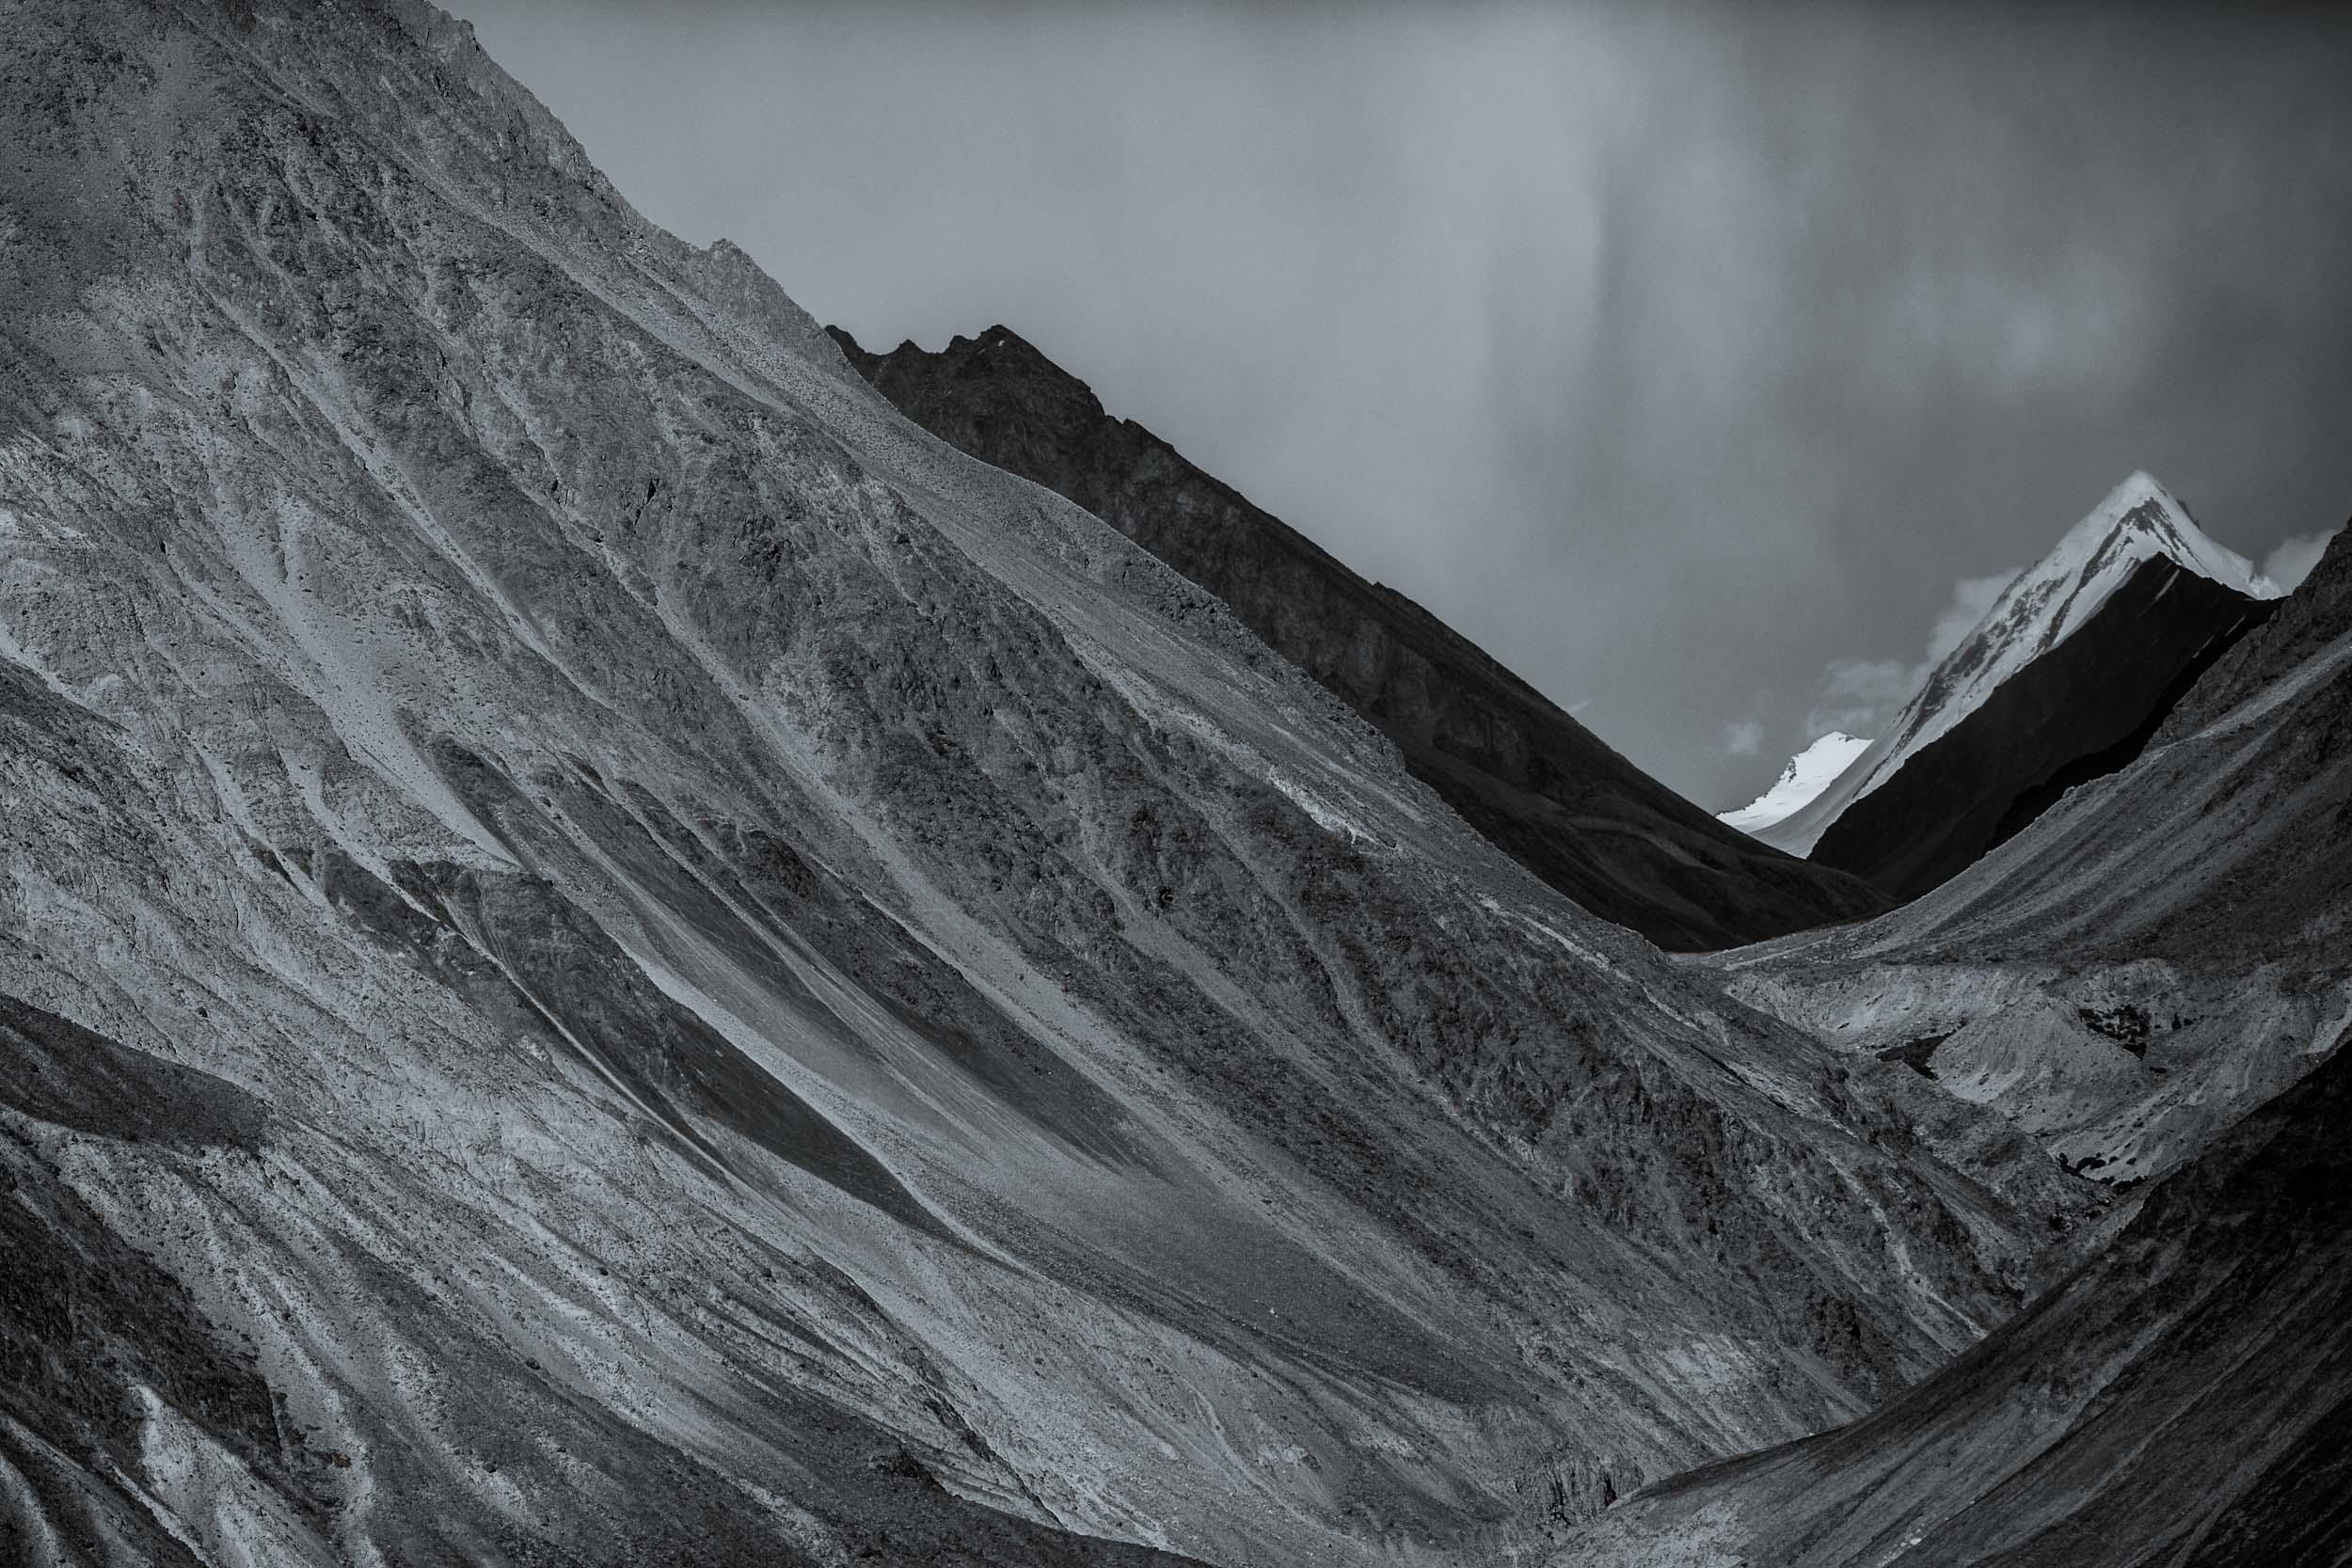 Sindhur_Photography_Travel_Landscape_Ladakh-9.JPG